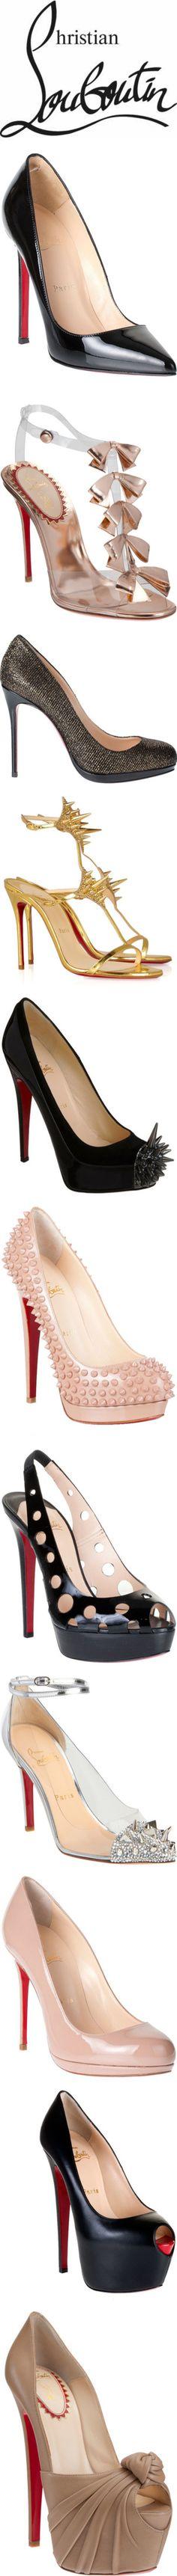 Christian Louboutin heels!